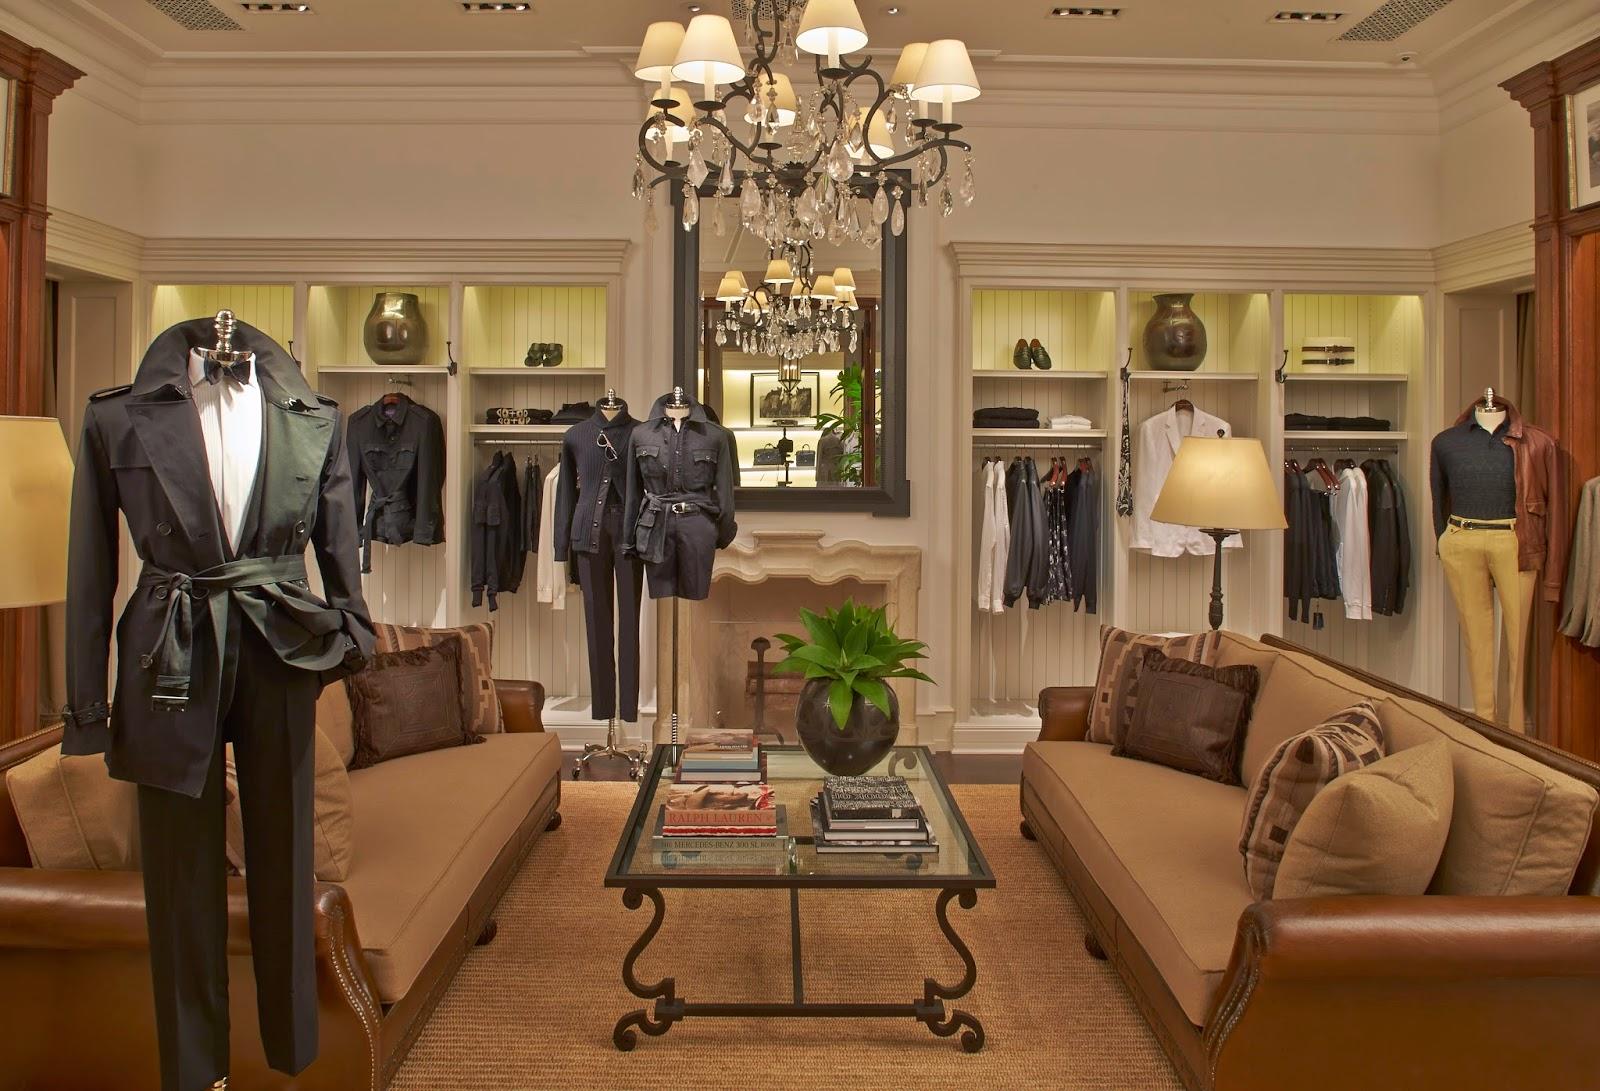 da023e445fd42 ... the prestigious Cidade Jardim and spanning over 850 square meters of  retail space